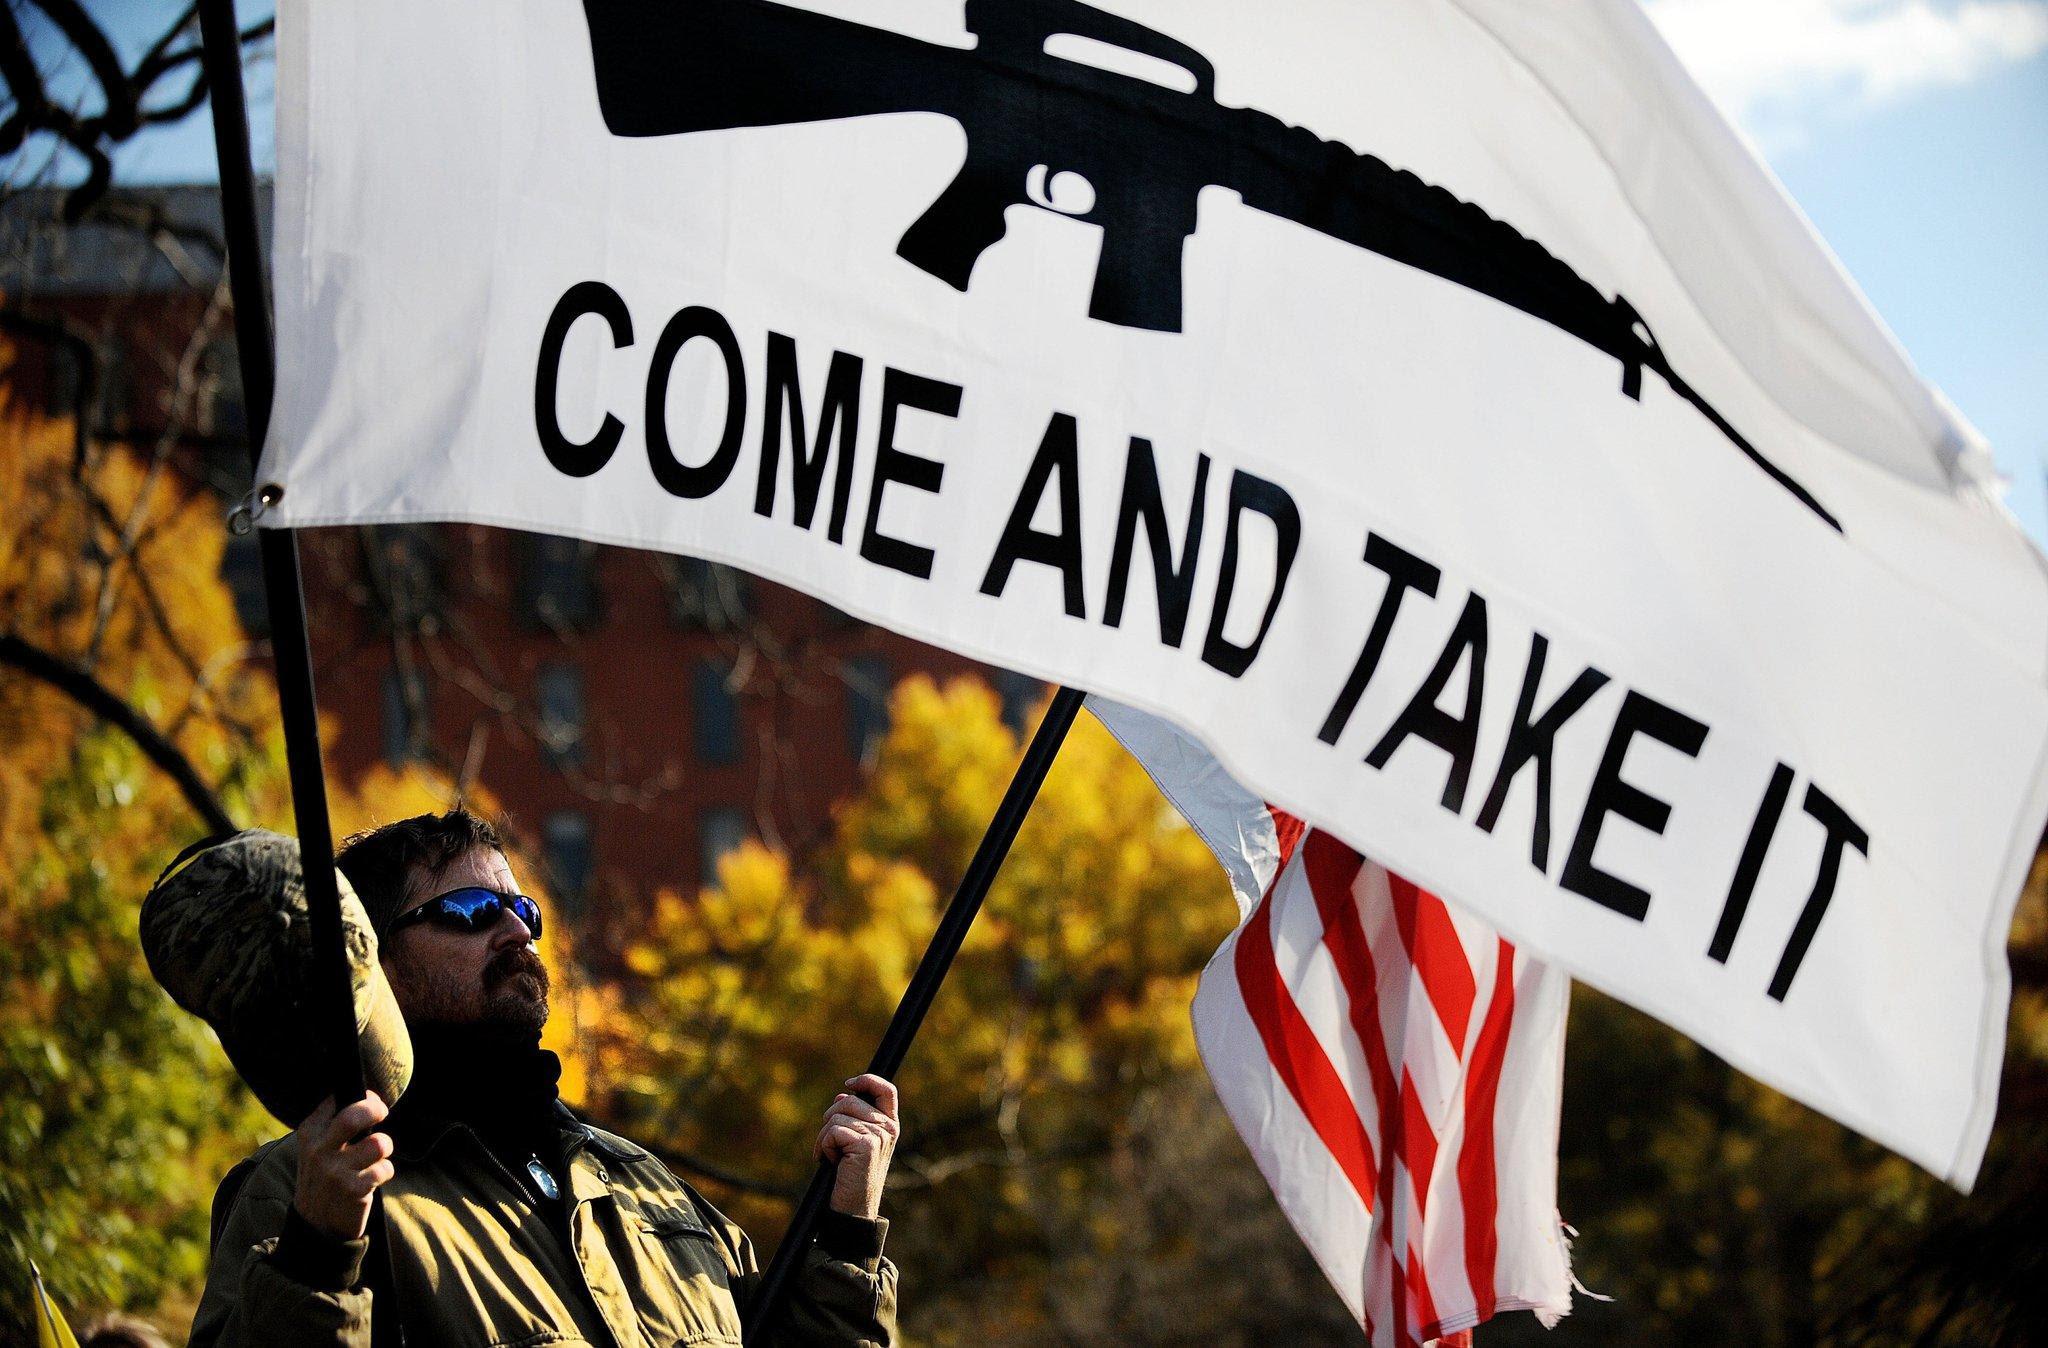 http://www.trbimg.com/img-52c74878/turbine/la-pn-guns-obama-administration-20140103-001/2048/2048x1348